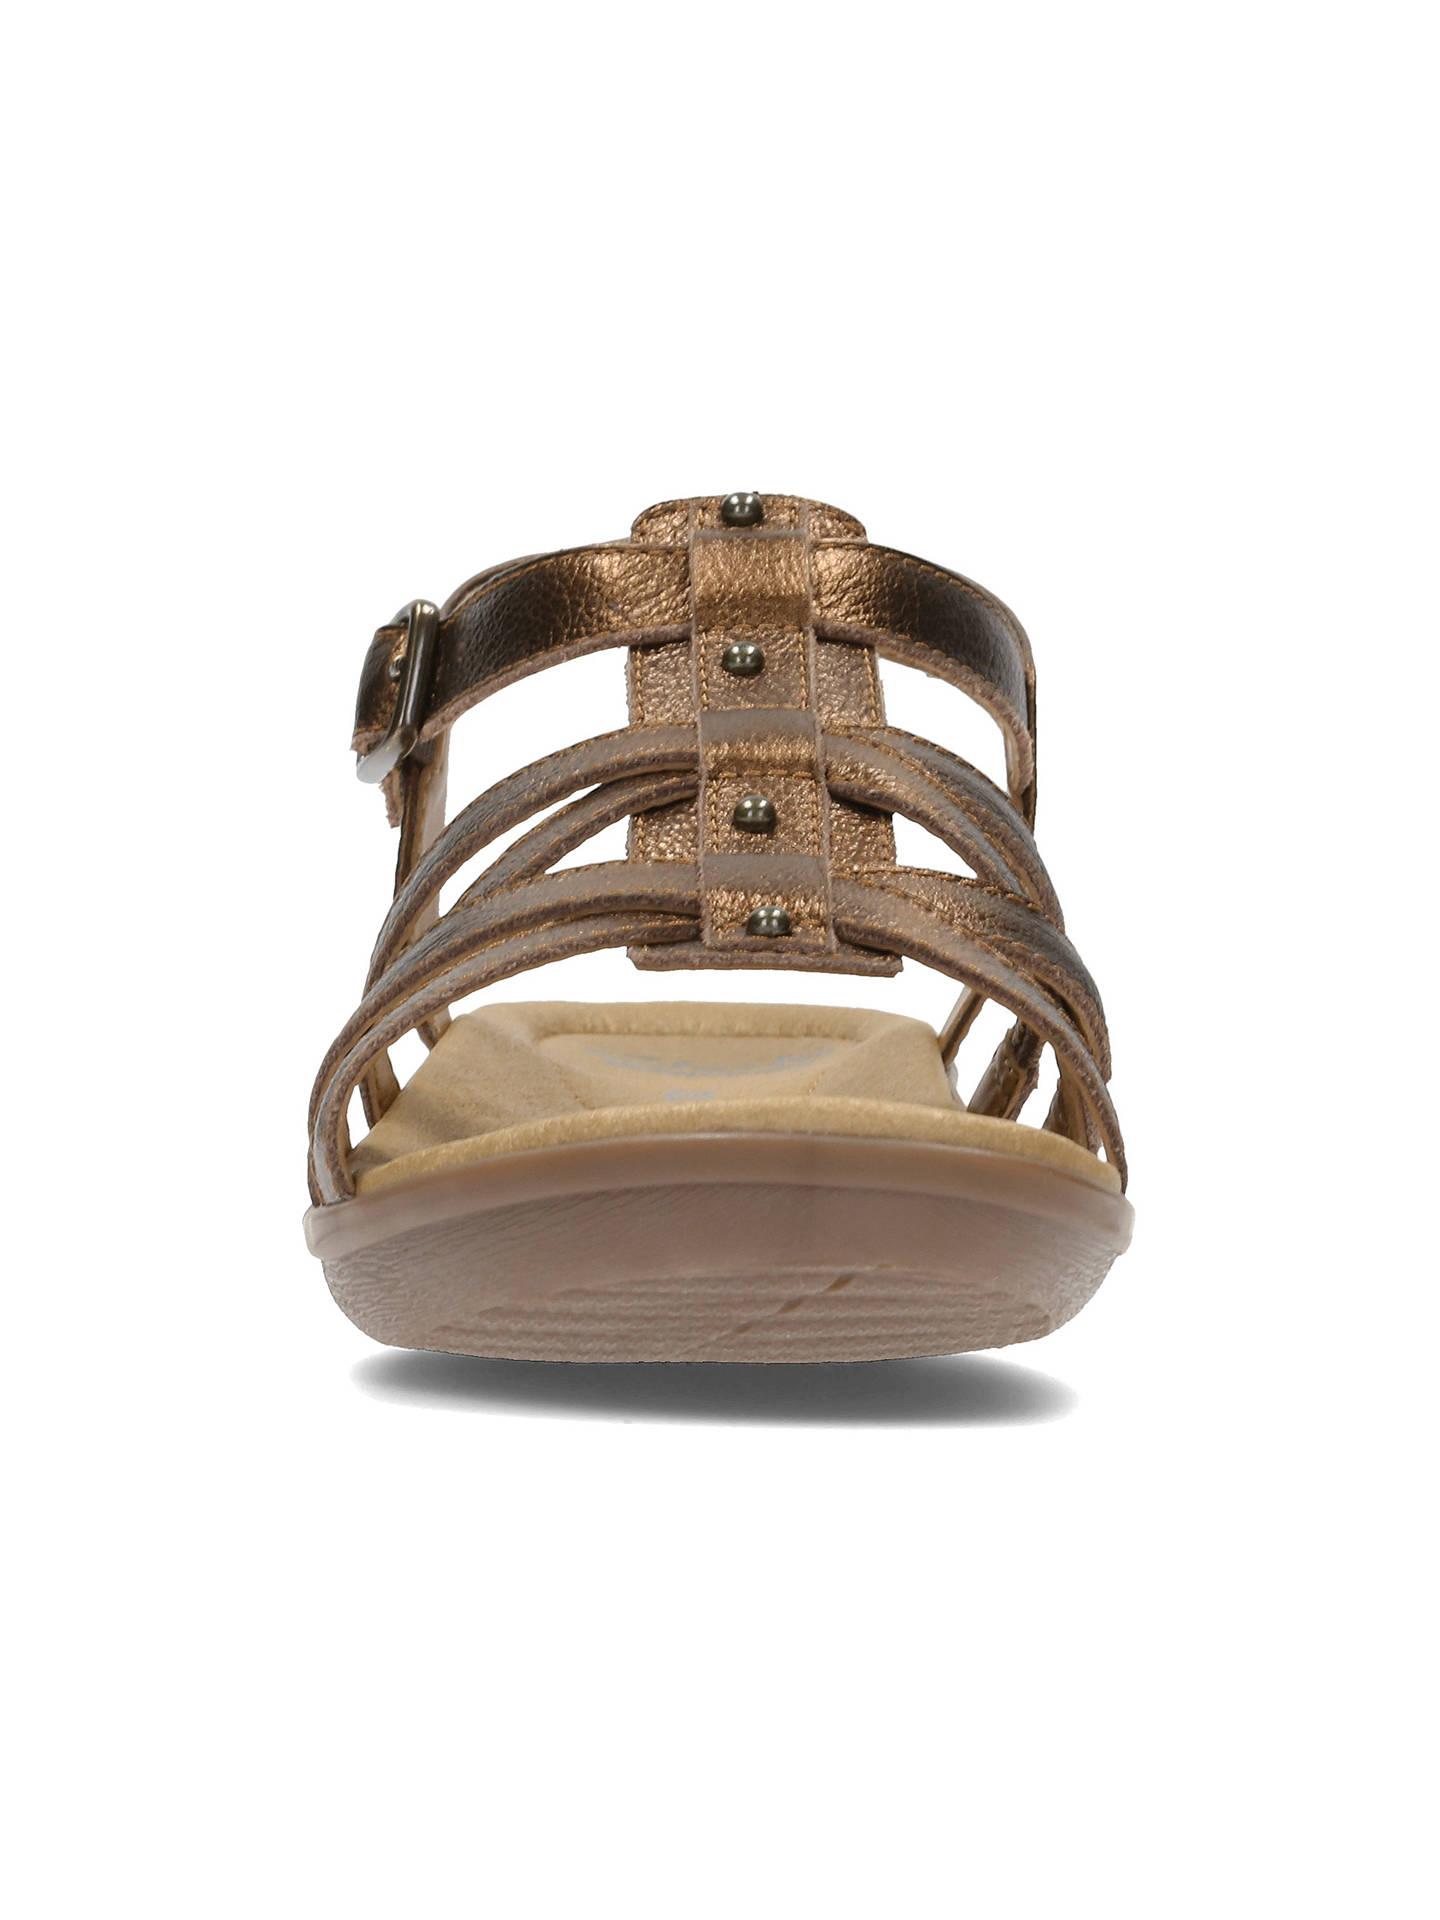 50ec48c743a9 ... Buy Clarks Manilla Bonita Multi Strap Sandals